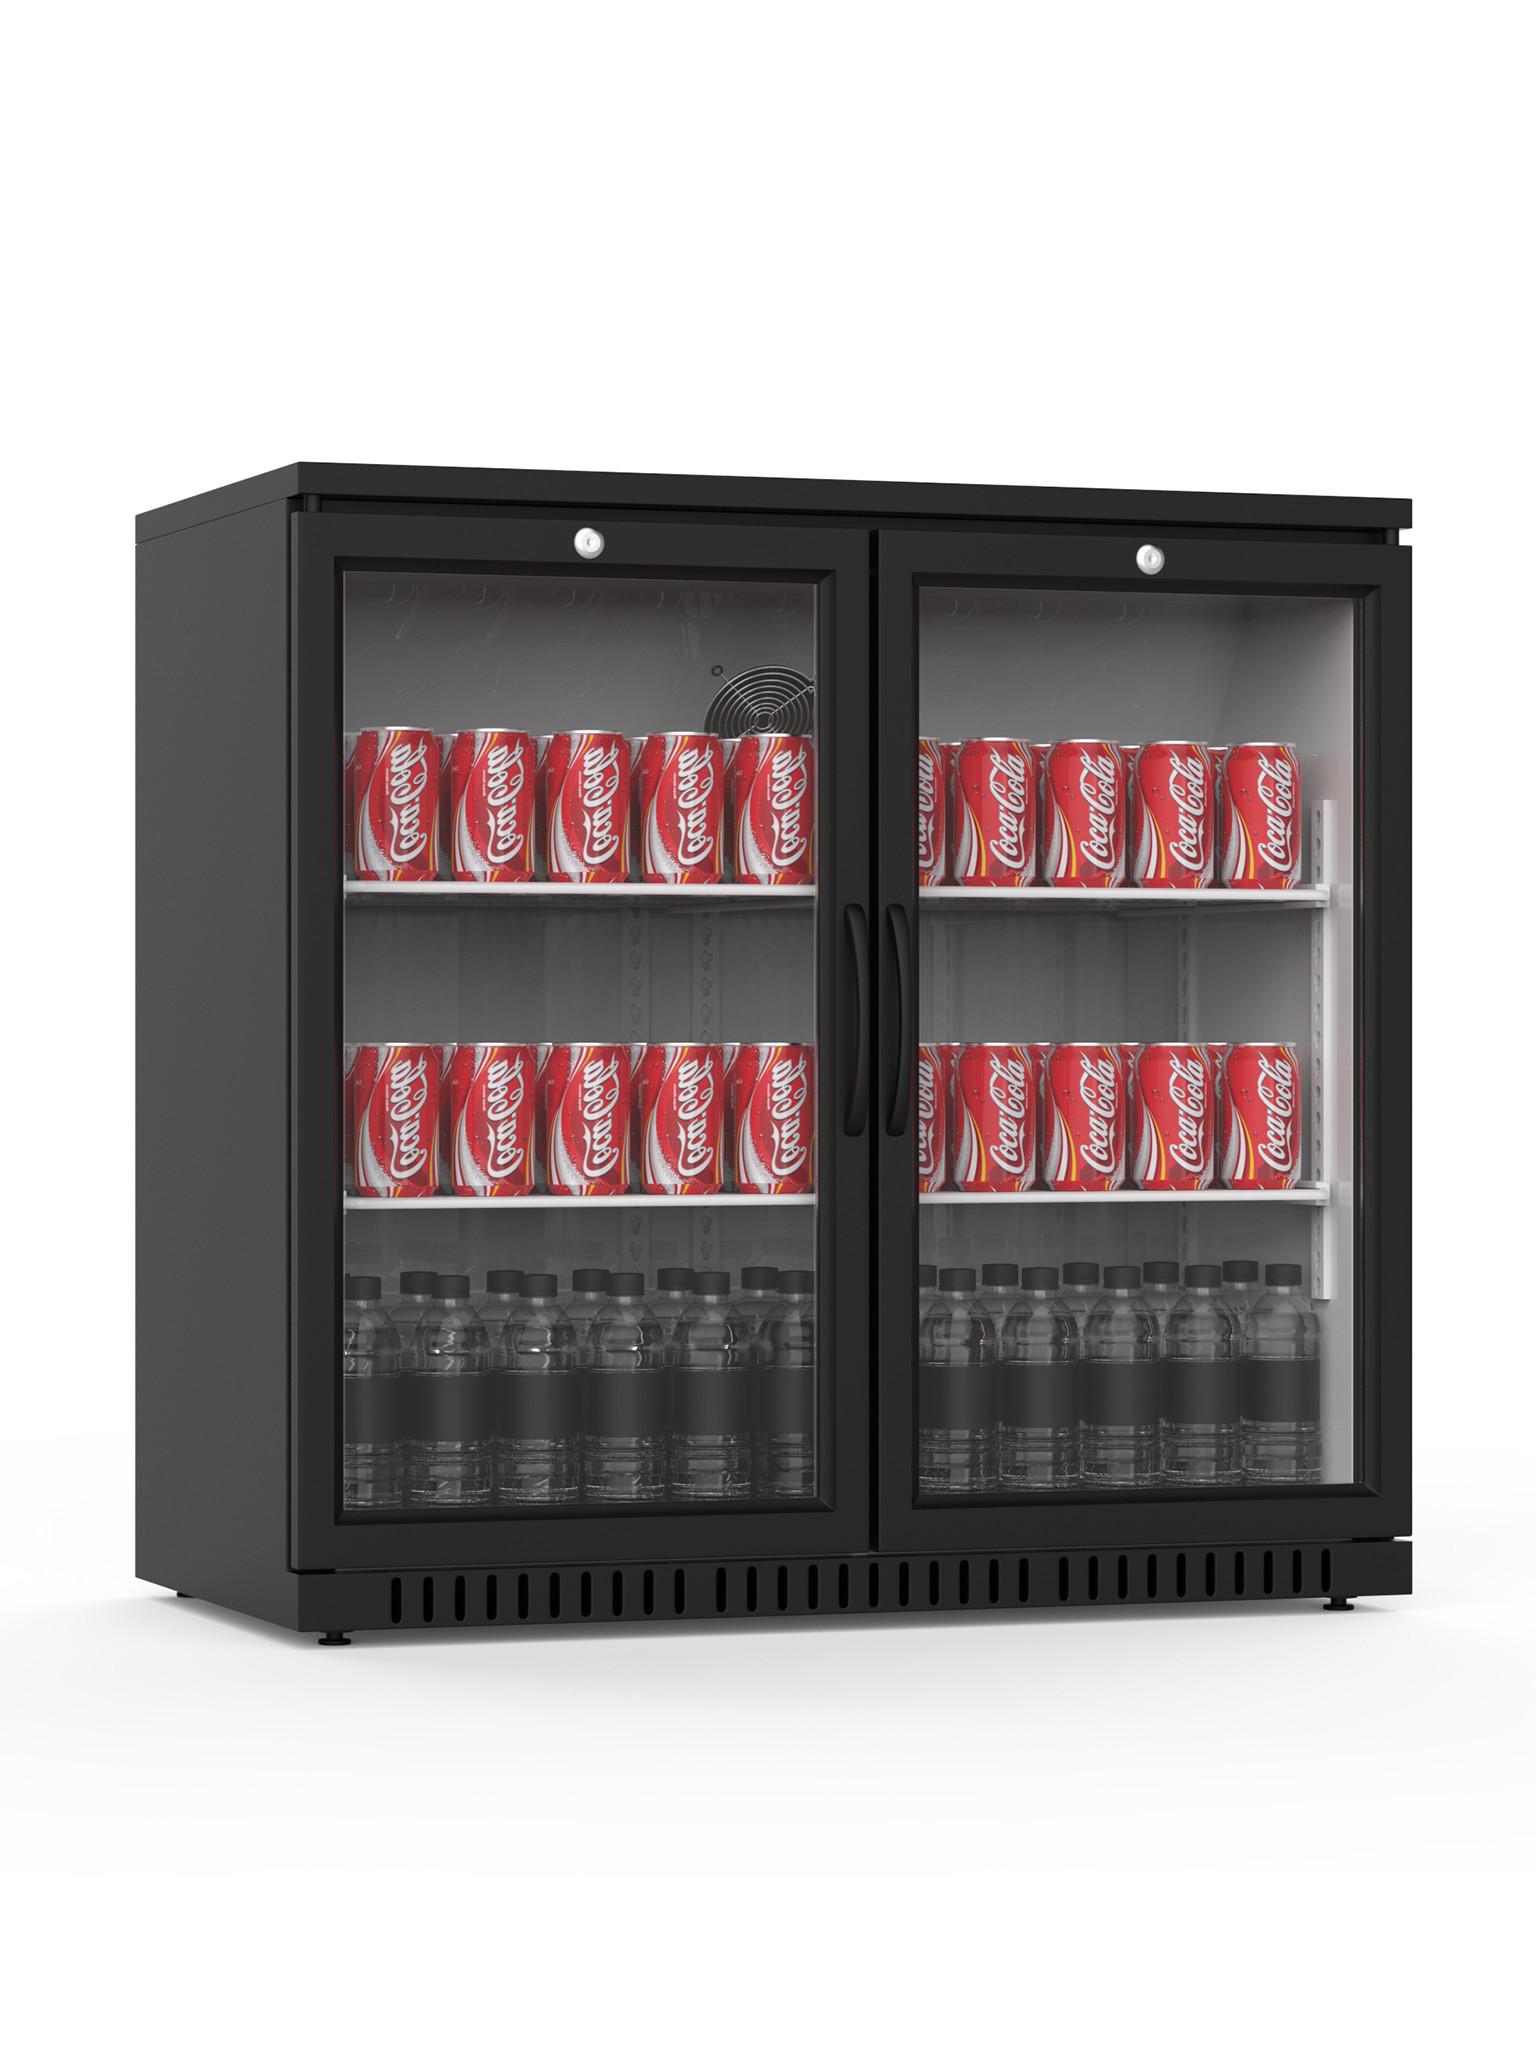 Promoline - 210 liter - 2 deurs - Zwart | Koelkast glazen deur